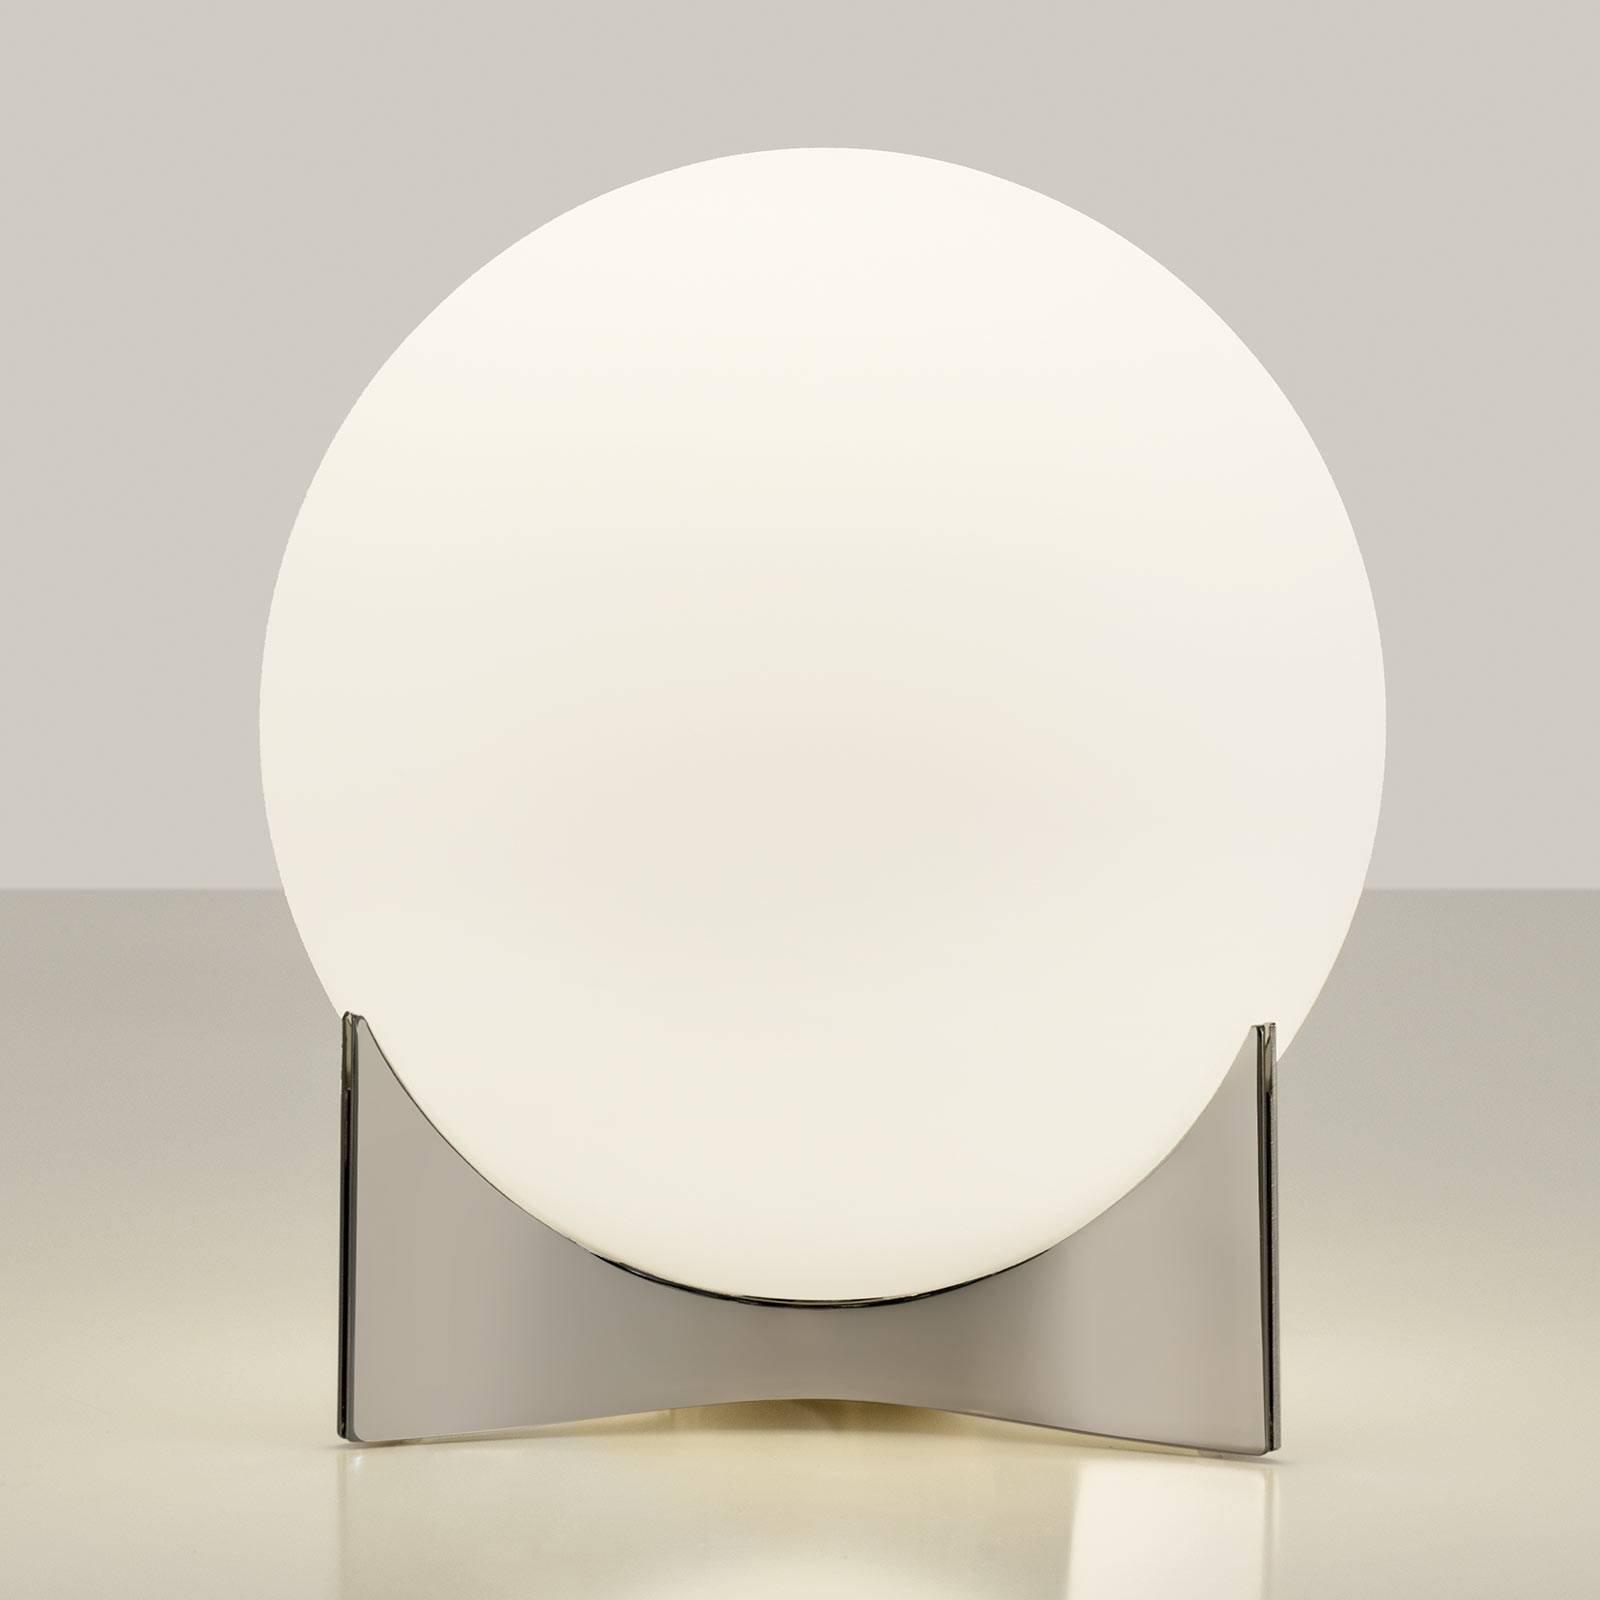 Terzani Oscar bordlampe av glass, nikkel